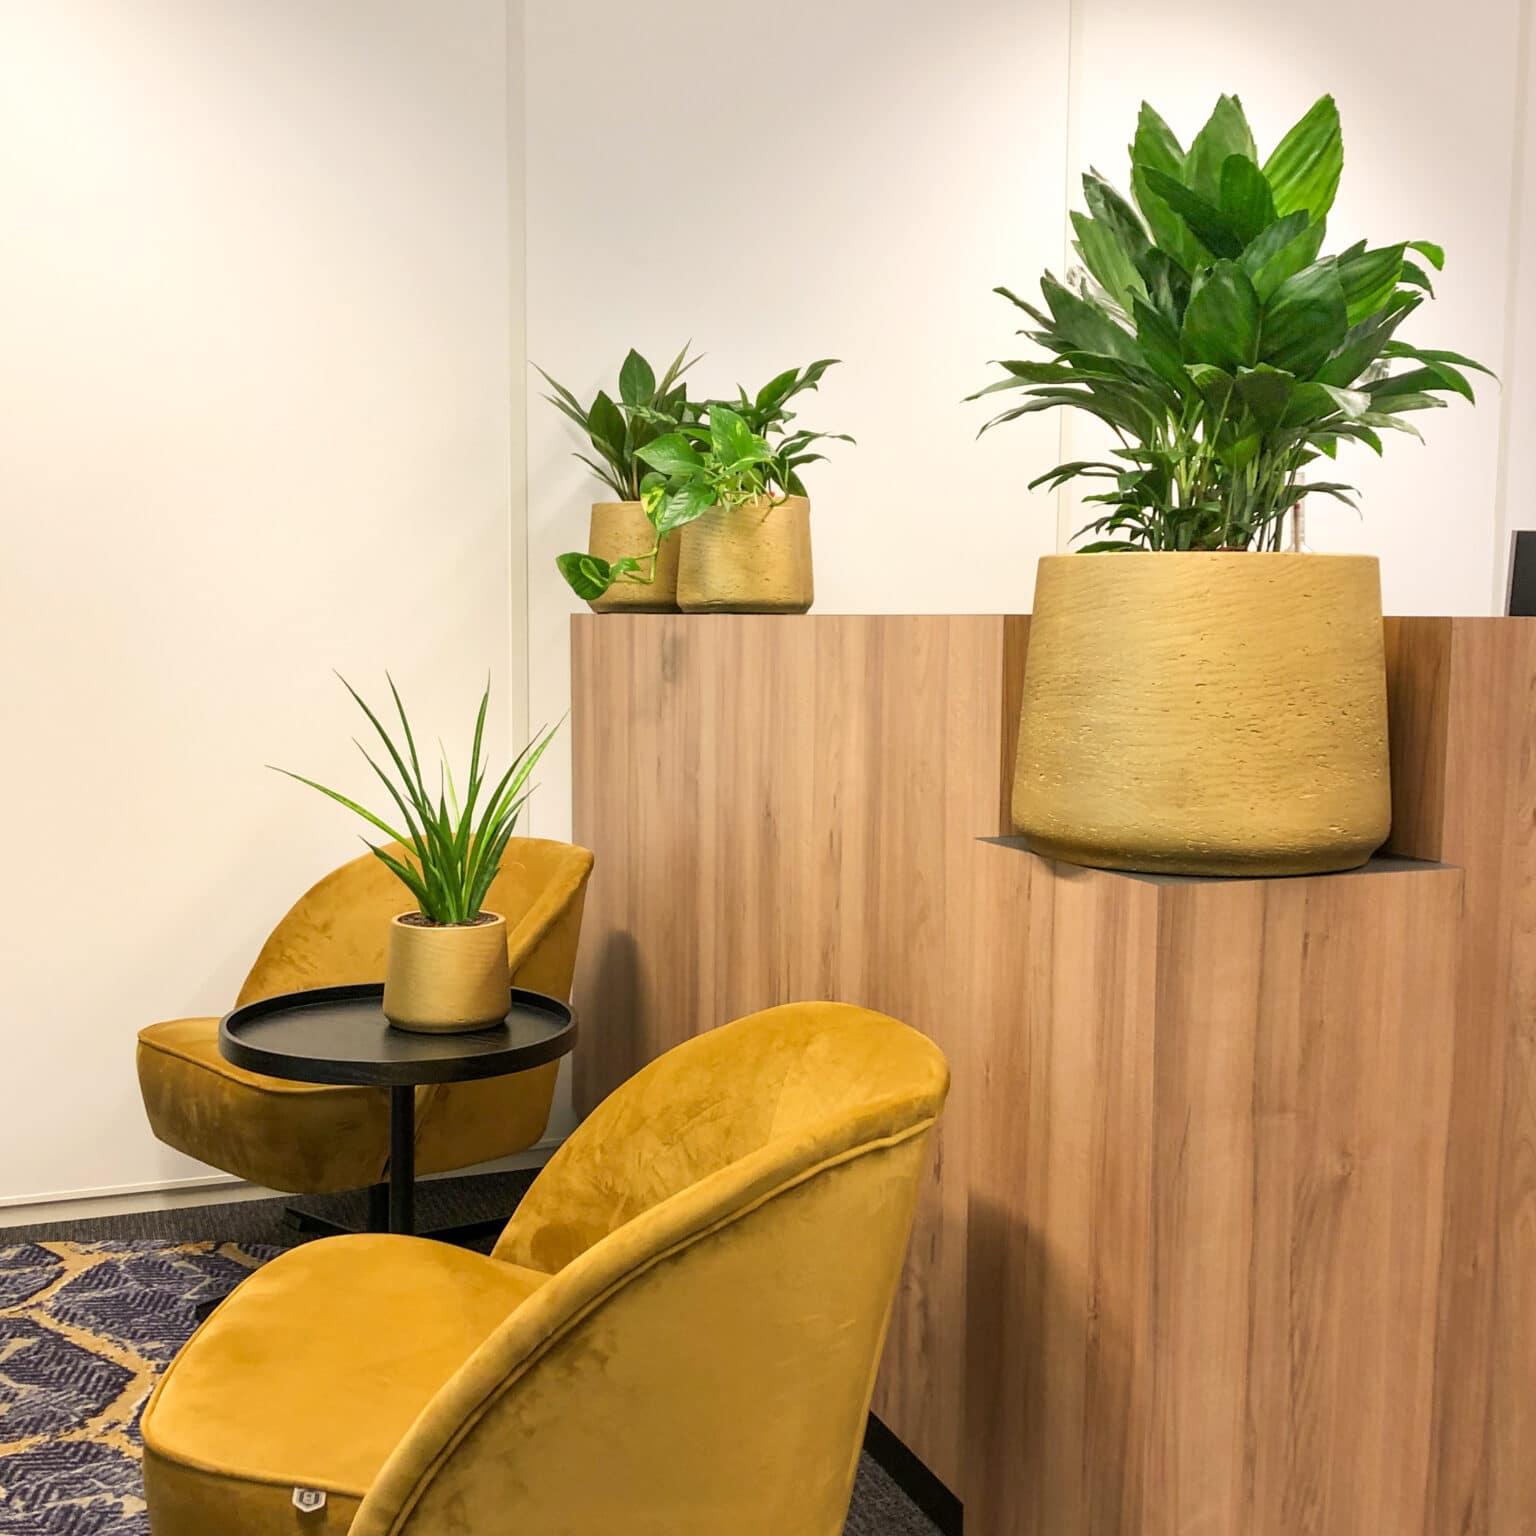 Geel kantoor interieur